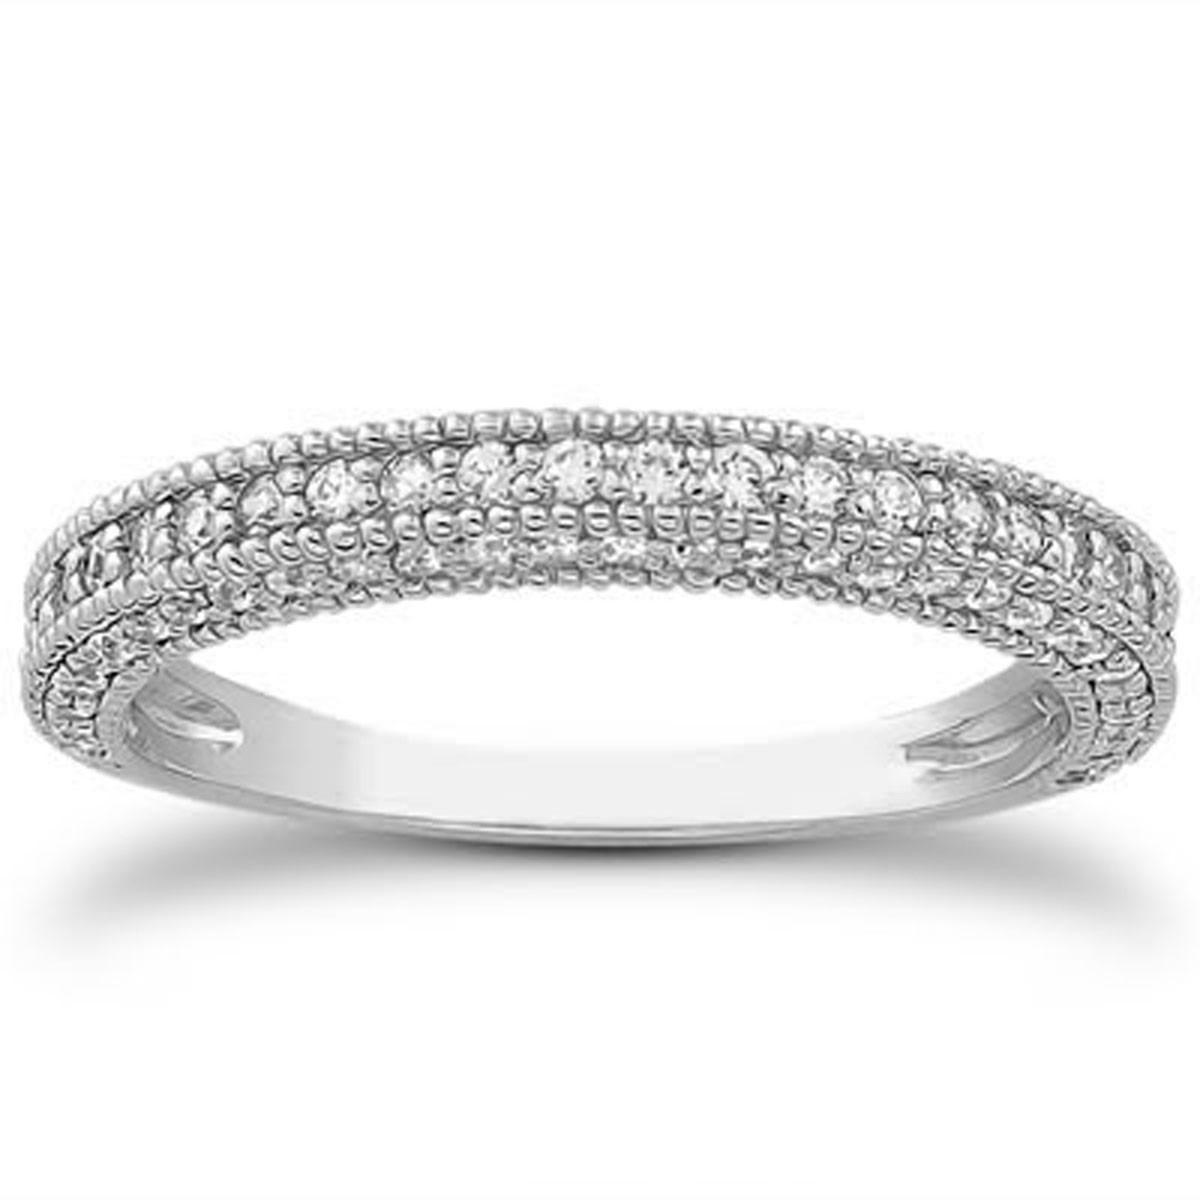 Fancy Pave Diamond Milgrain Wedding Ring Band in 14K White Gold milgrain wedding band Fancy Pave Diamond Milgrain Wedding Ring Band in 14K White Gold Richard Cannon Jewelry